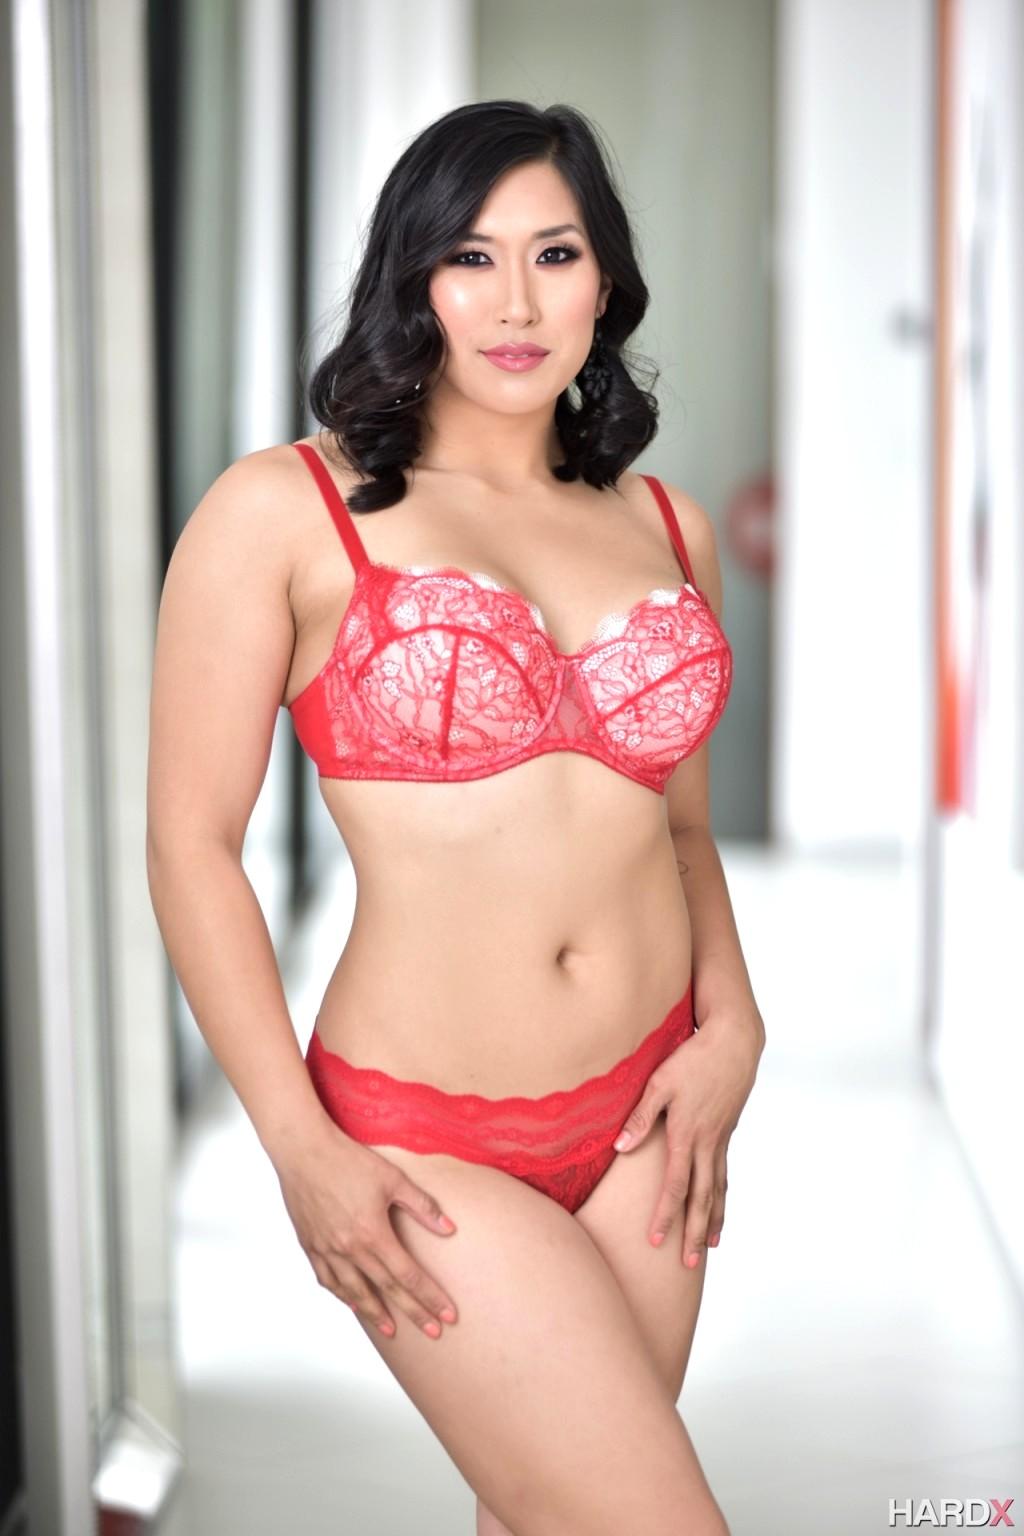 Babe Today Hardx Mia Li Winter Big Tits Yourporn Porn Pics-7742